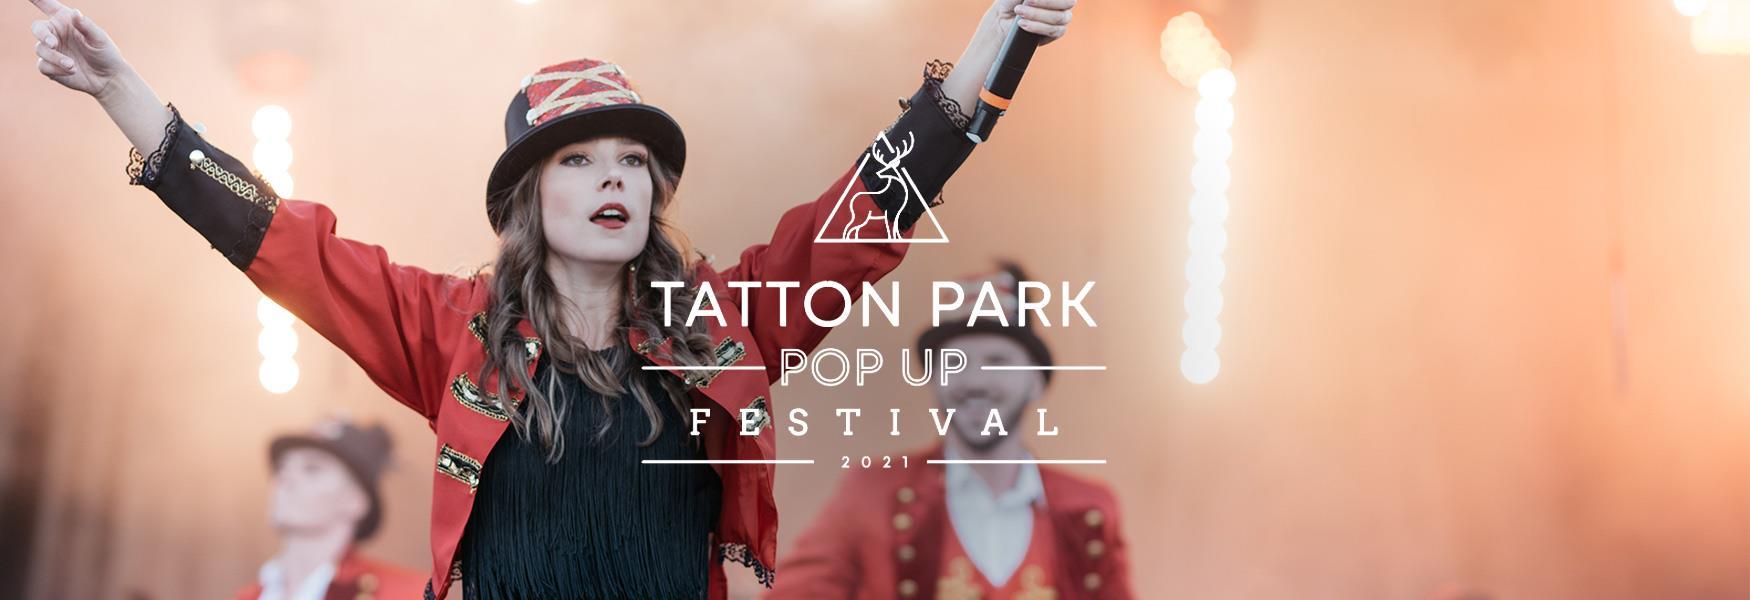 Tatton Park Pop Up Festival